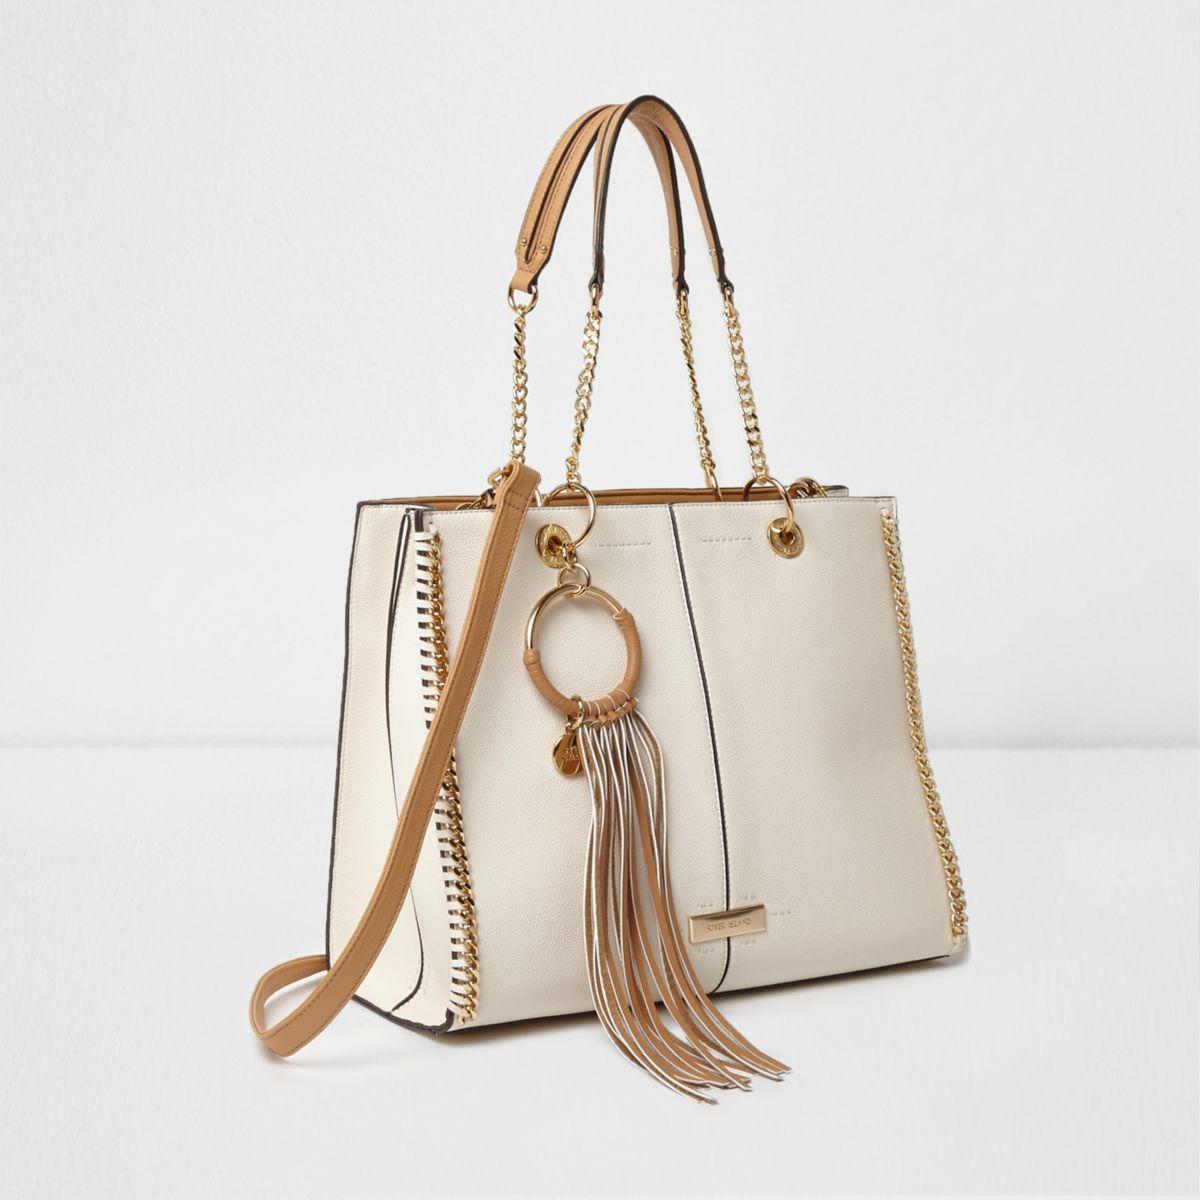 Cream and tan fringe hoop chain trim tote bag